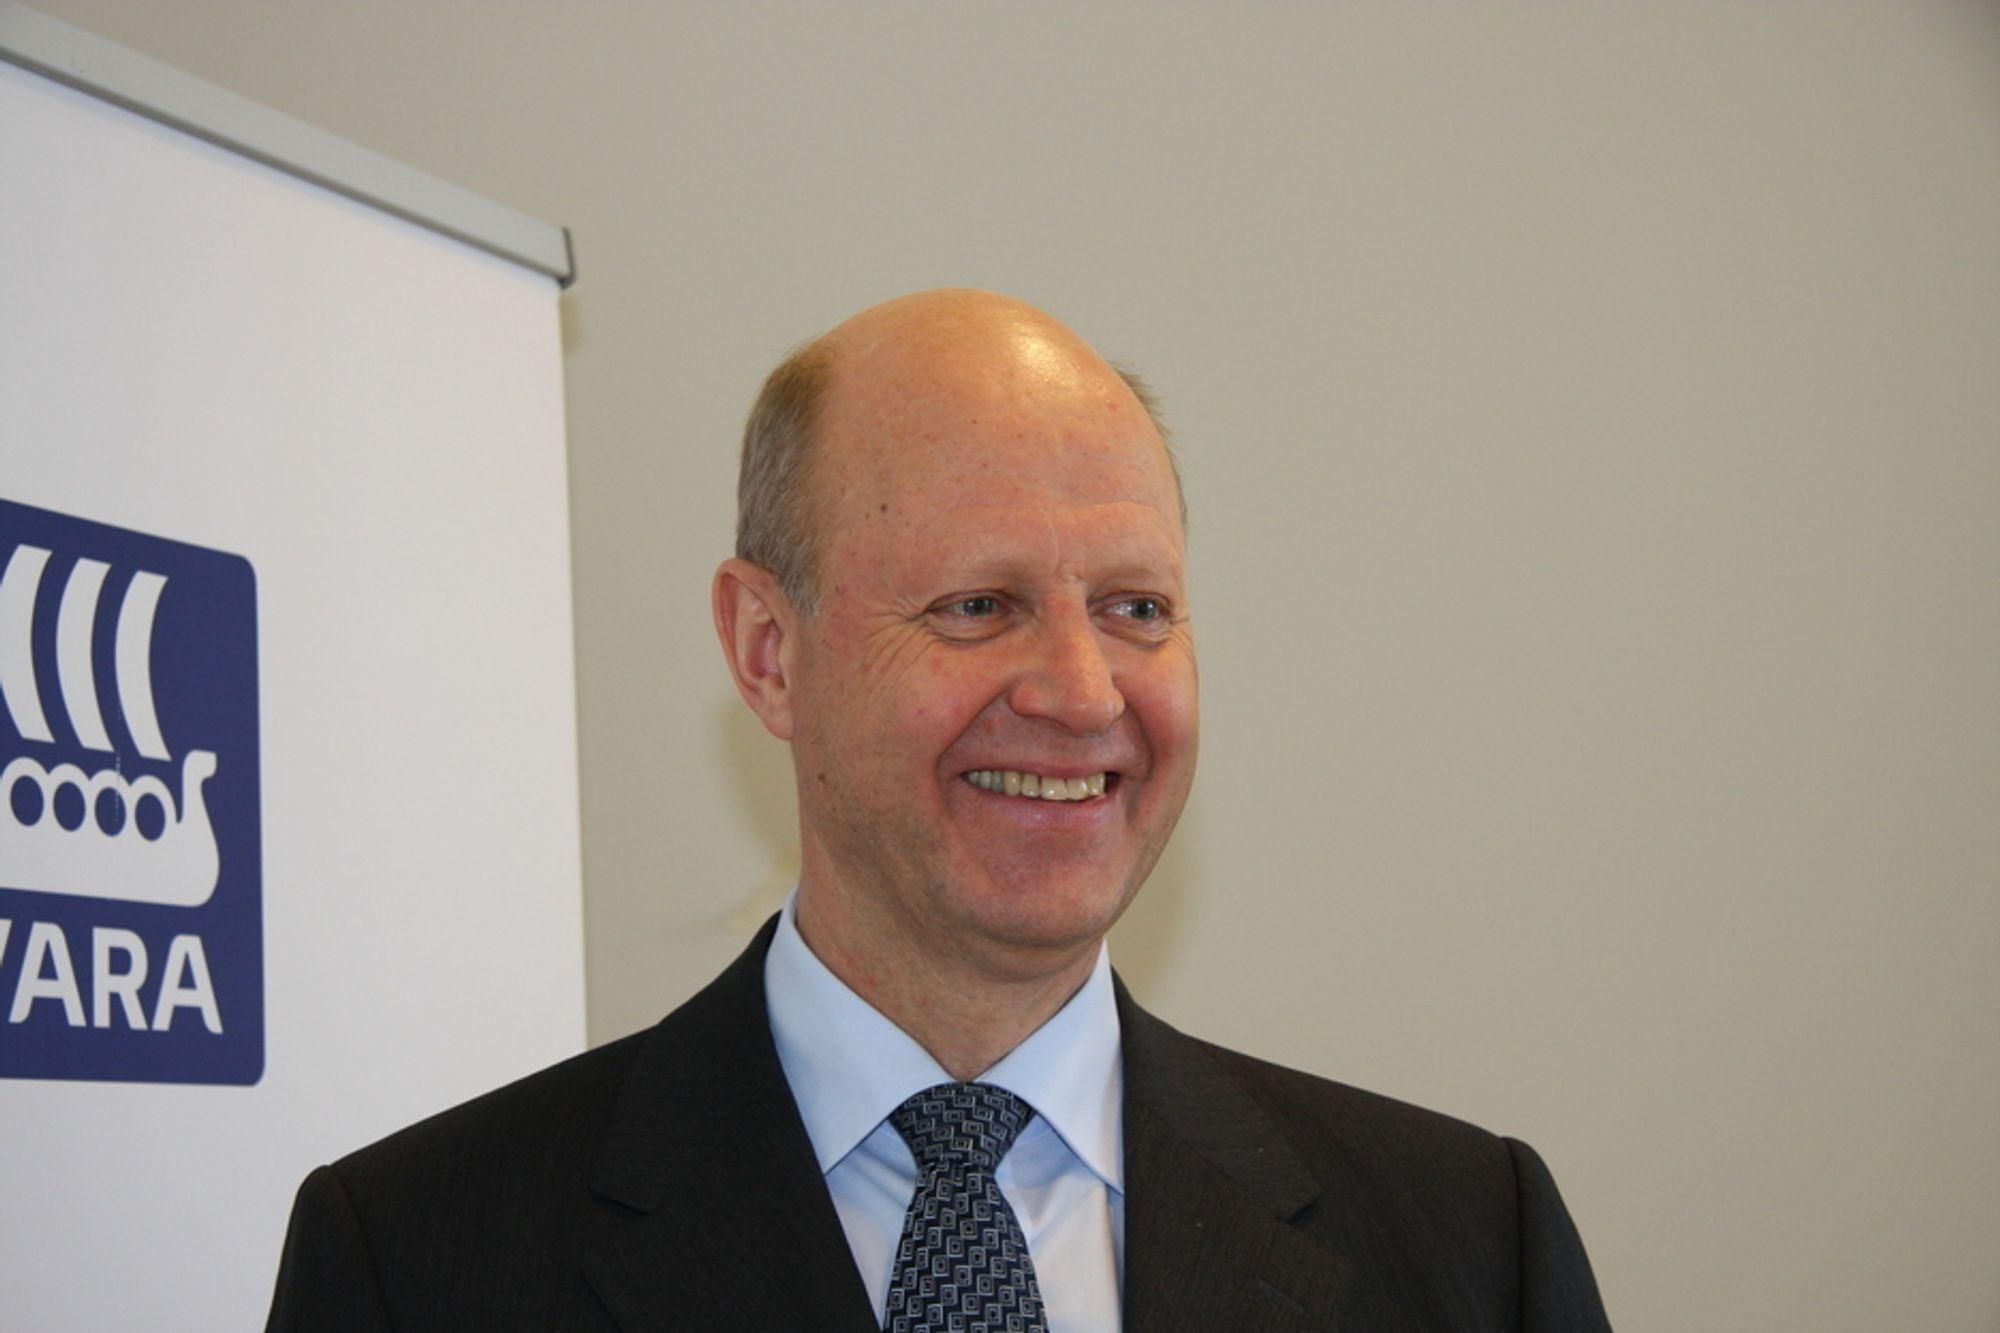 SMILER BREDT: Yarasjef Ole Jørgen Haslestad kan vise fram et resultat som langt ovegår egne forventninger.